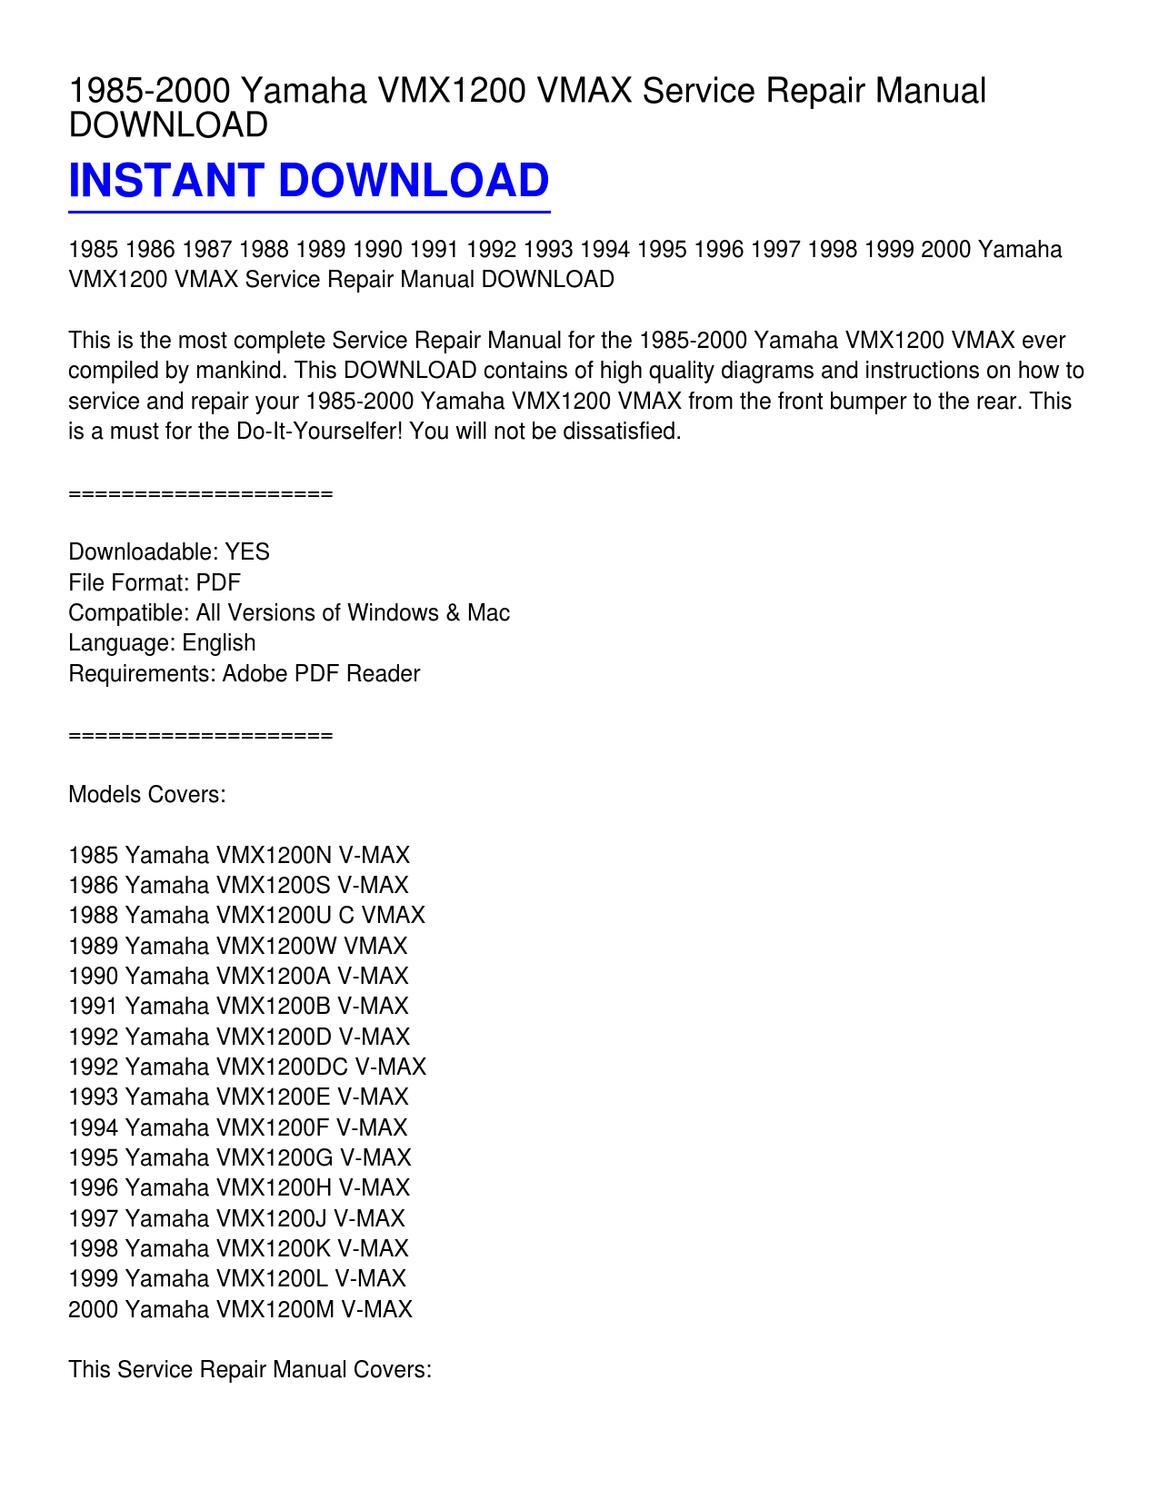 1985-2000 Yamaha VMX1200 VMAX Service Repair Manual DOWNLOAD by James  Shelton - issuu